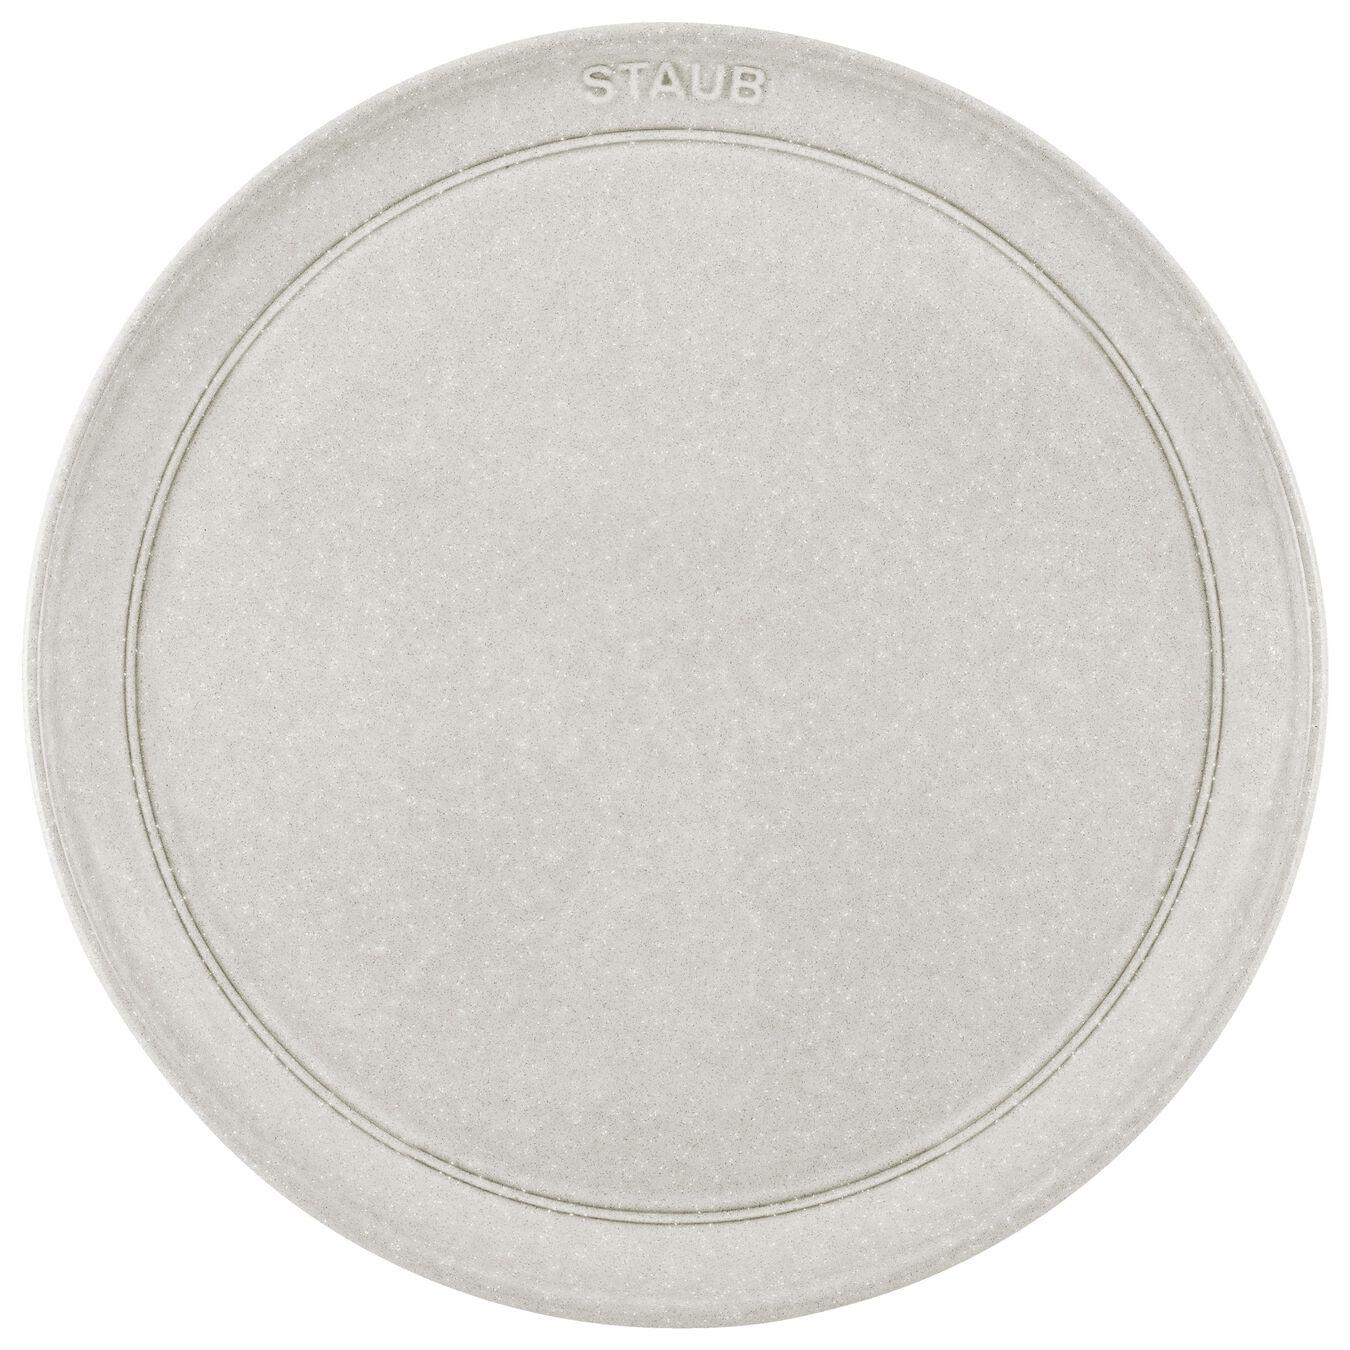 26 cm Ceramic round Assiette flat, White Truffle,,large 2